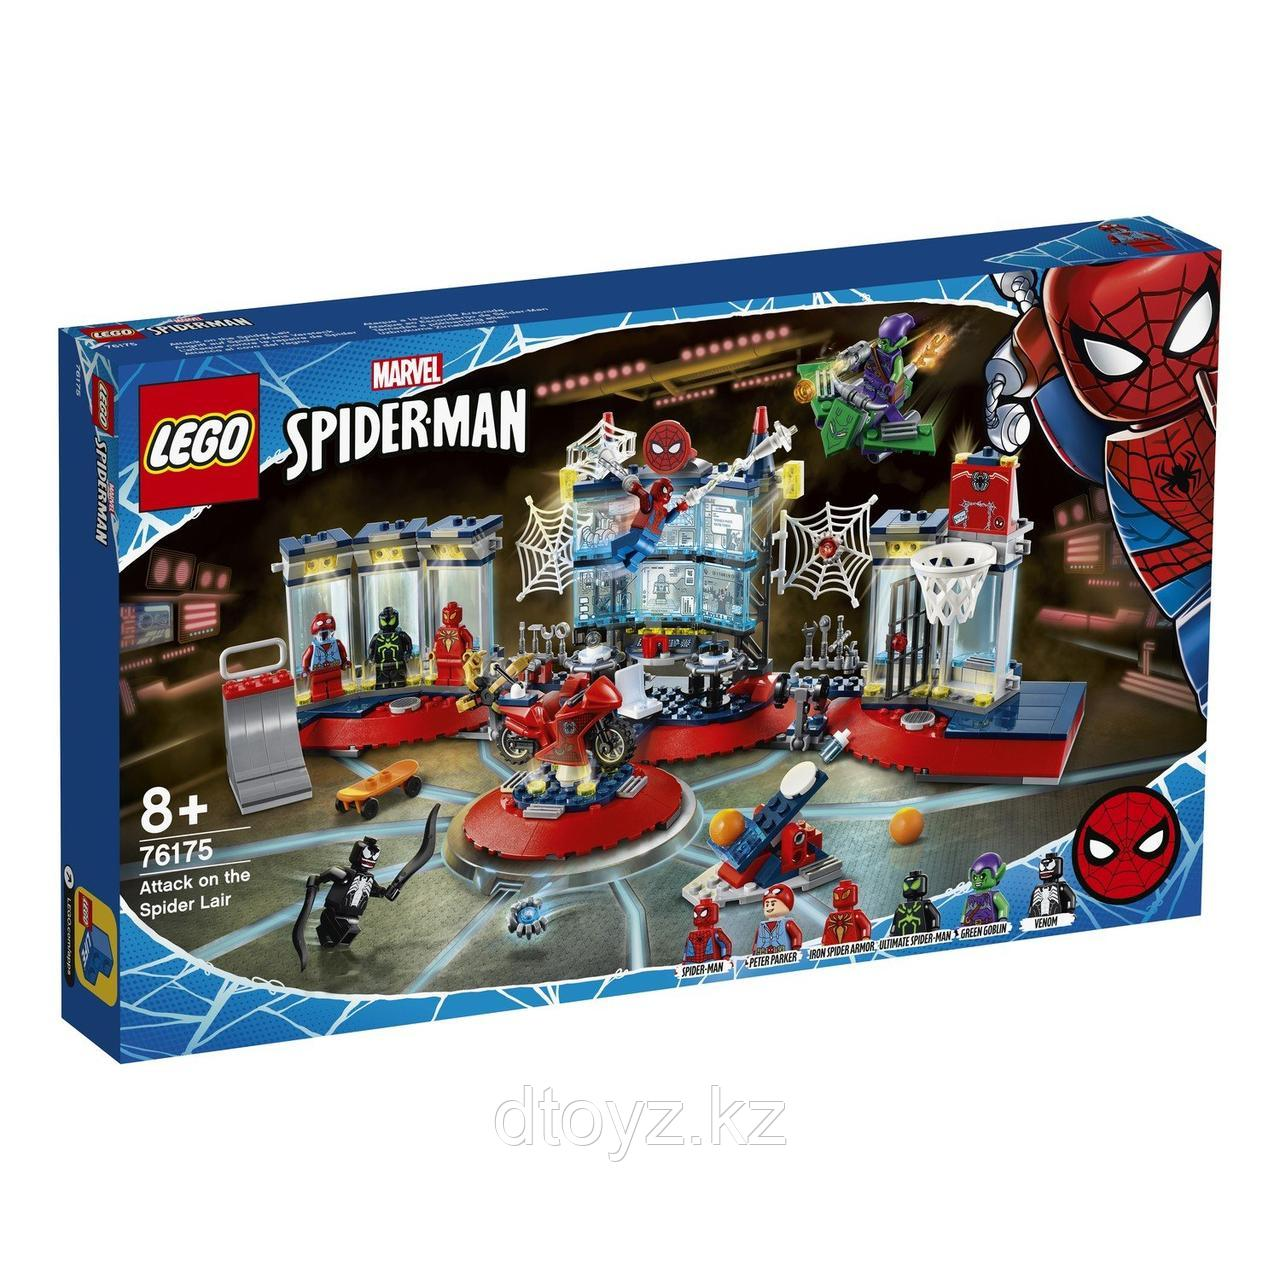 LEGO Marvel Super Heroes Нападение на мастерскую паука 76175